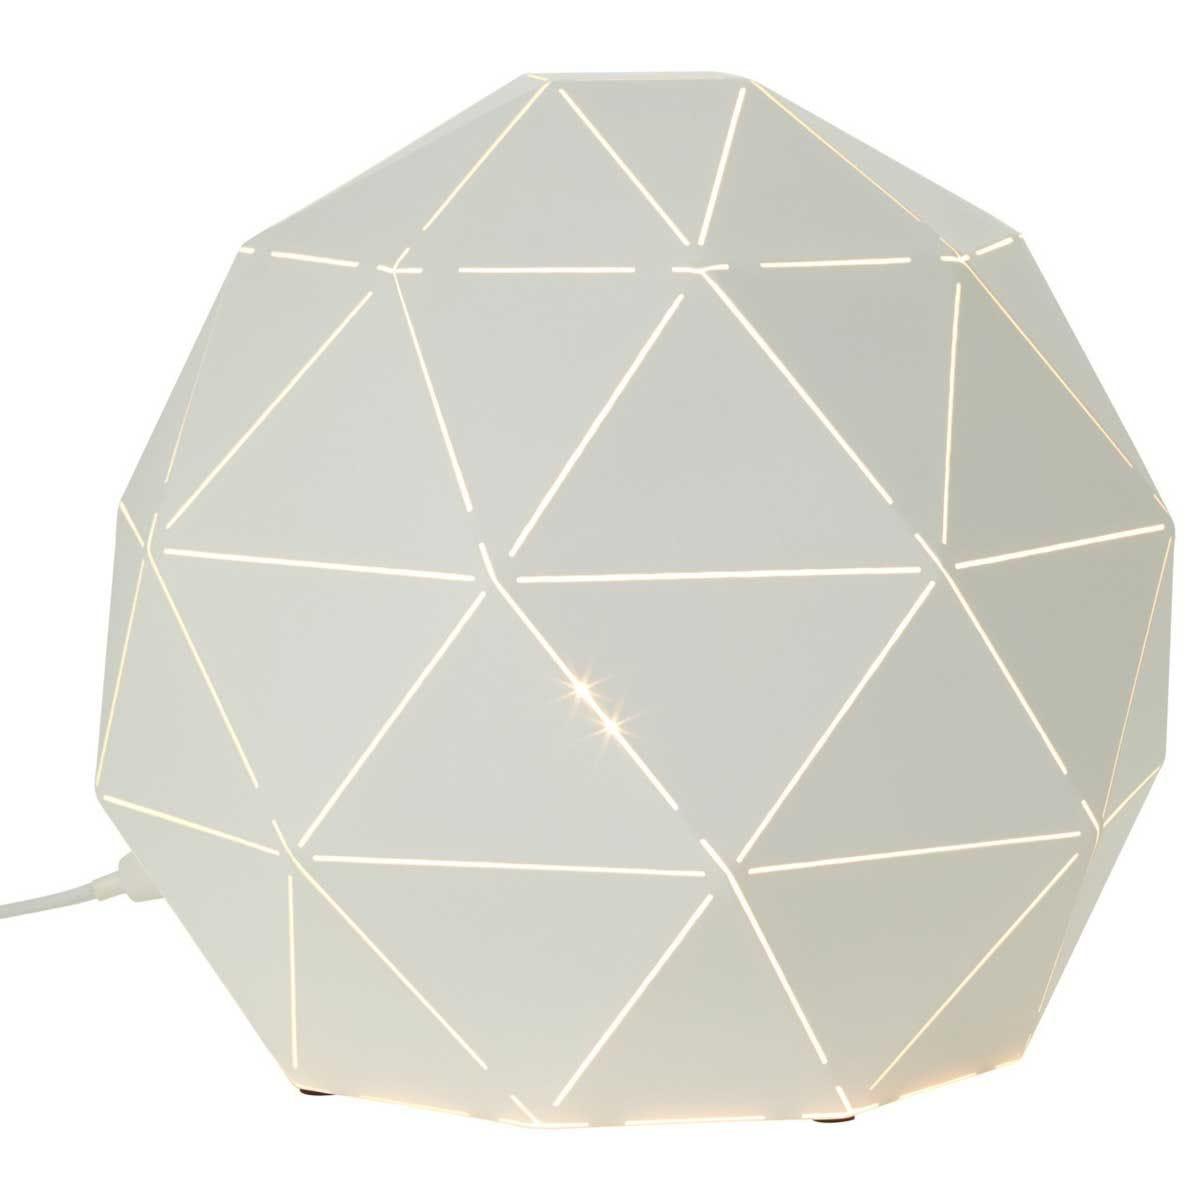 Premier Housewares Mateo Table Lamp - White